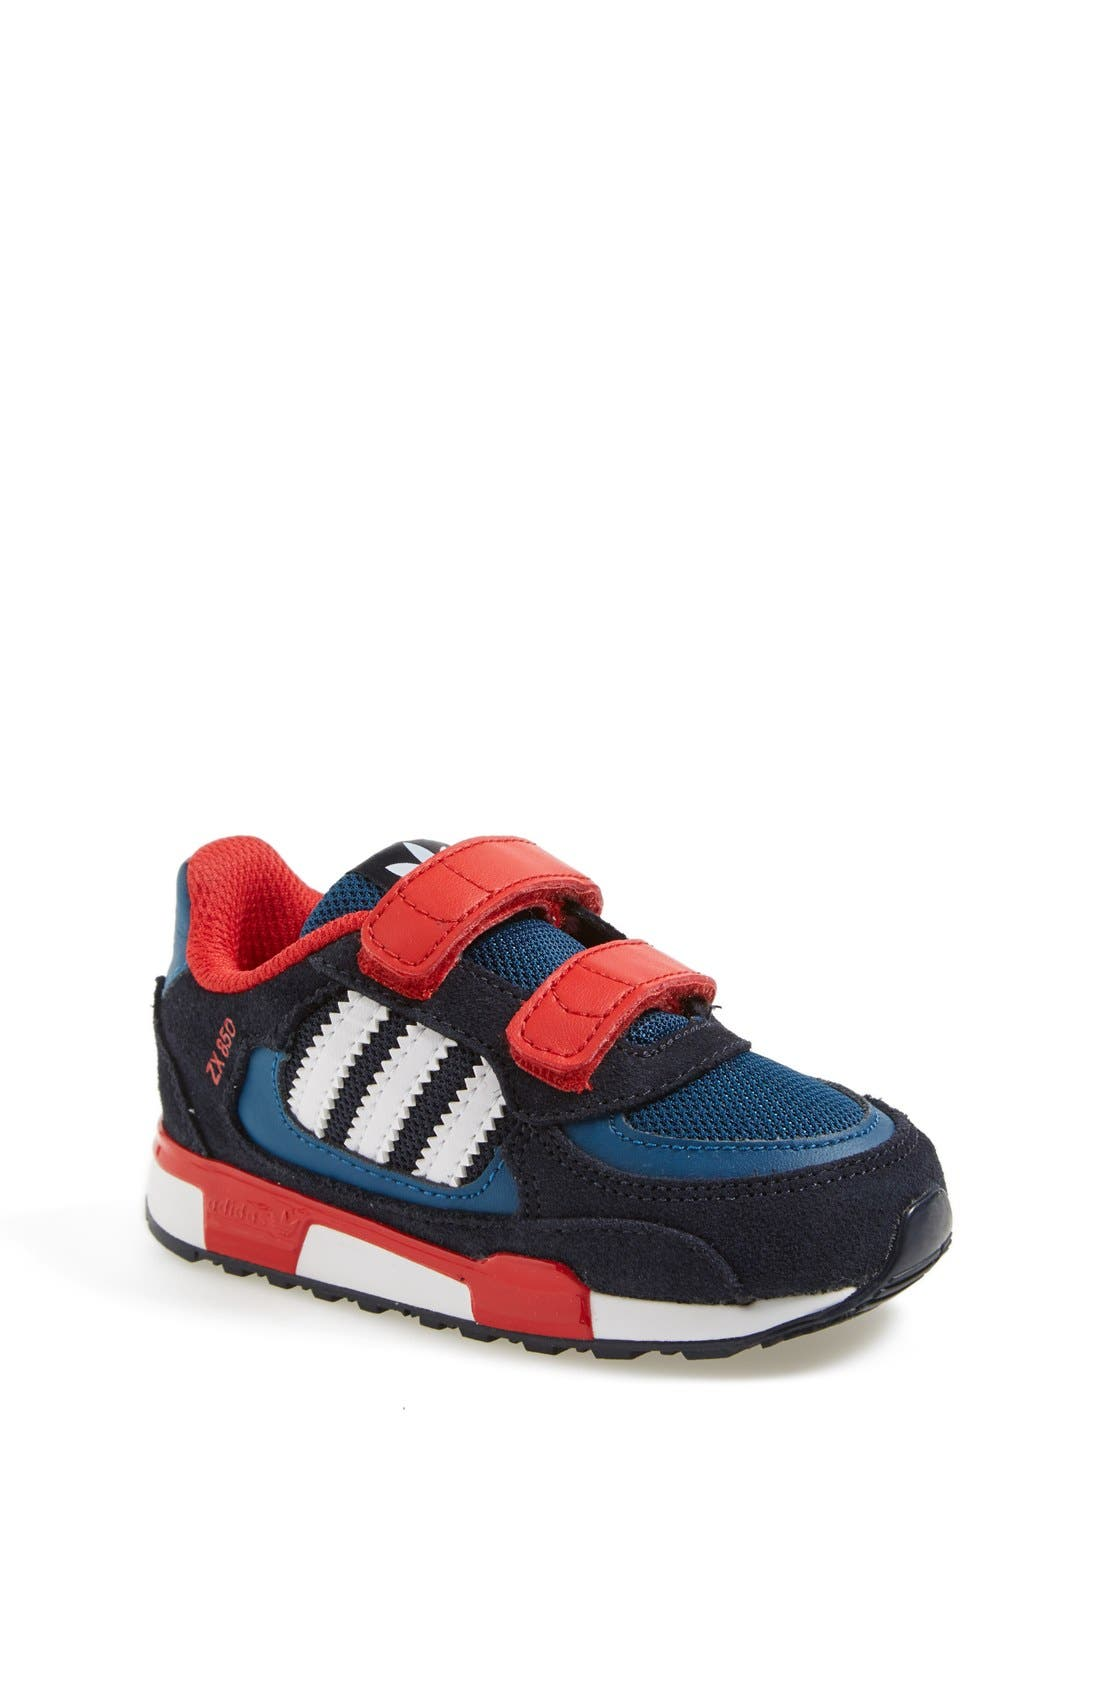 Main Image - adidas 'ZXZ 850' Sneaker (Baby, Walker & Toddler)